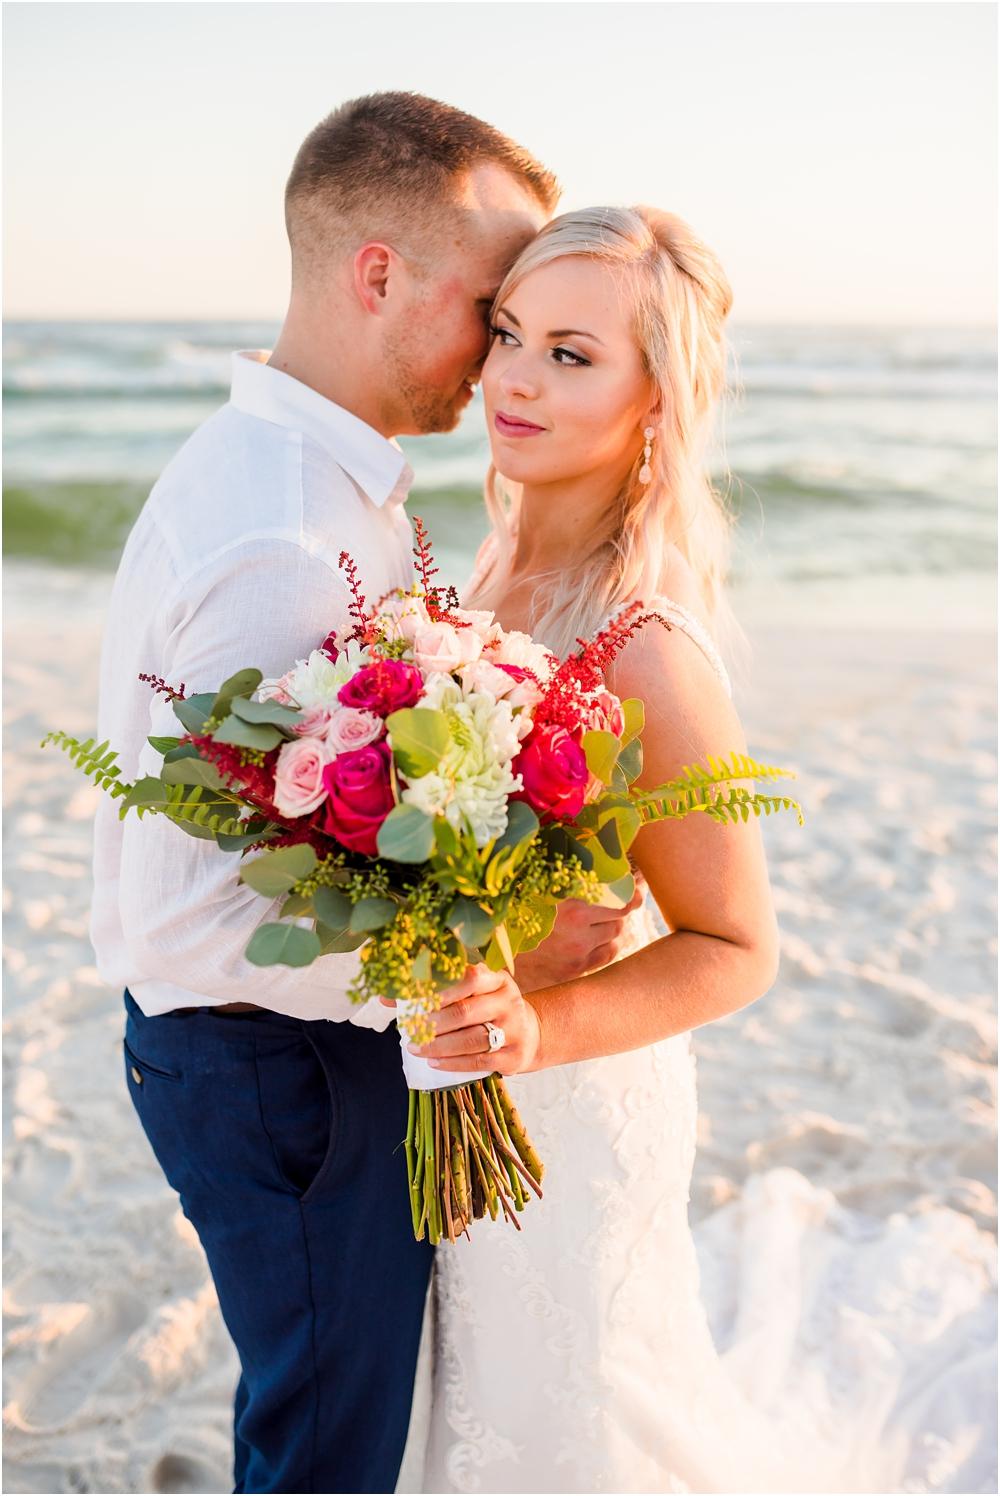 mcglothlin-wedding-kiersten-stevenson-photography-30a-panama-city-beach-dothan-tallahassee-(104-of-145).jpg